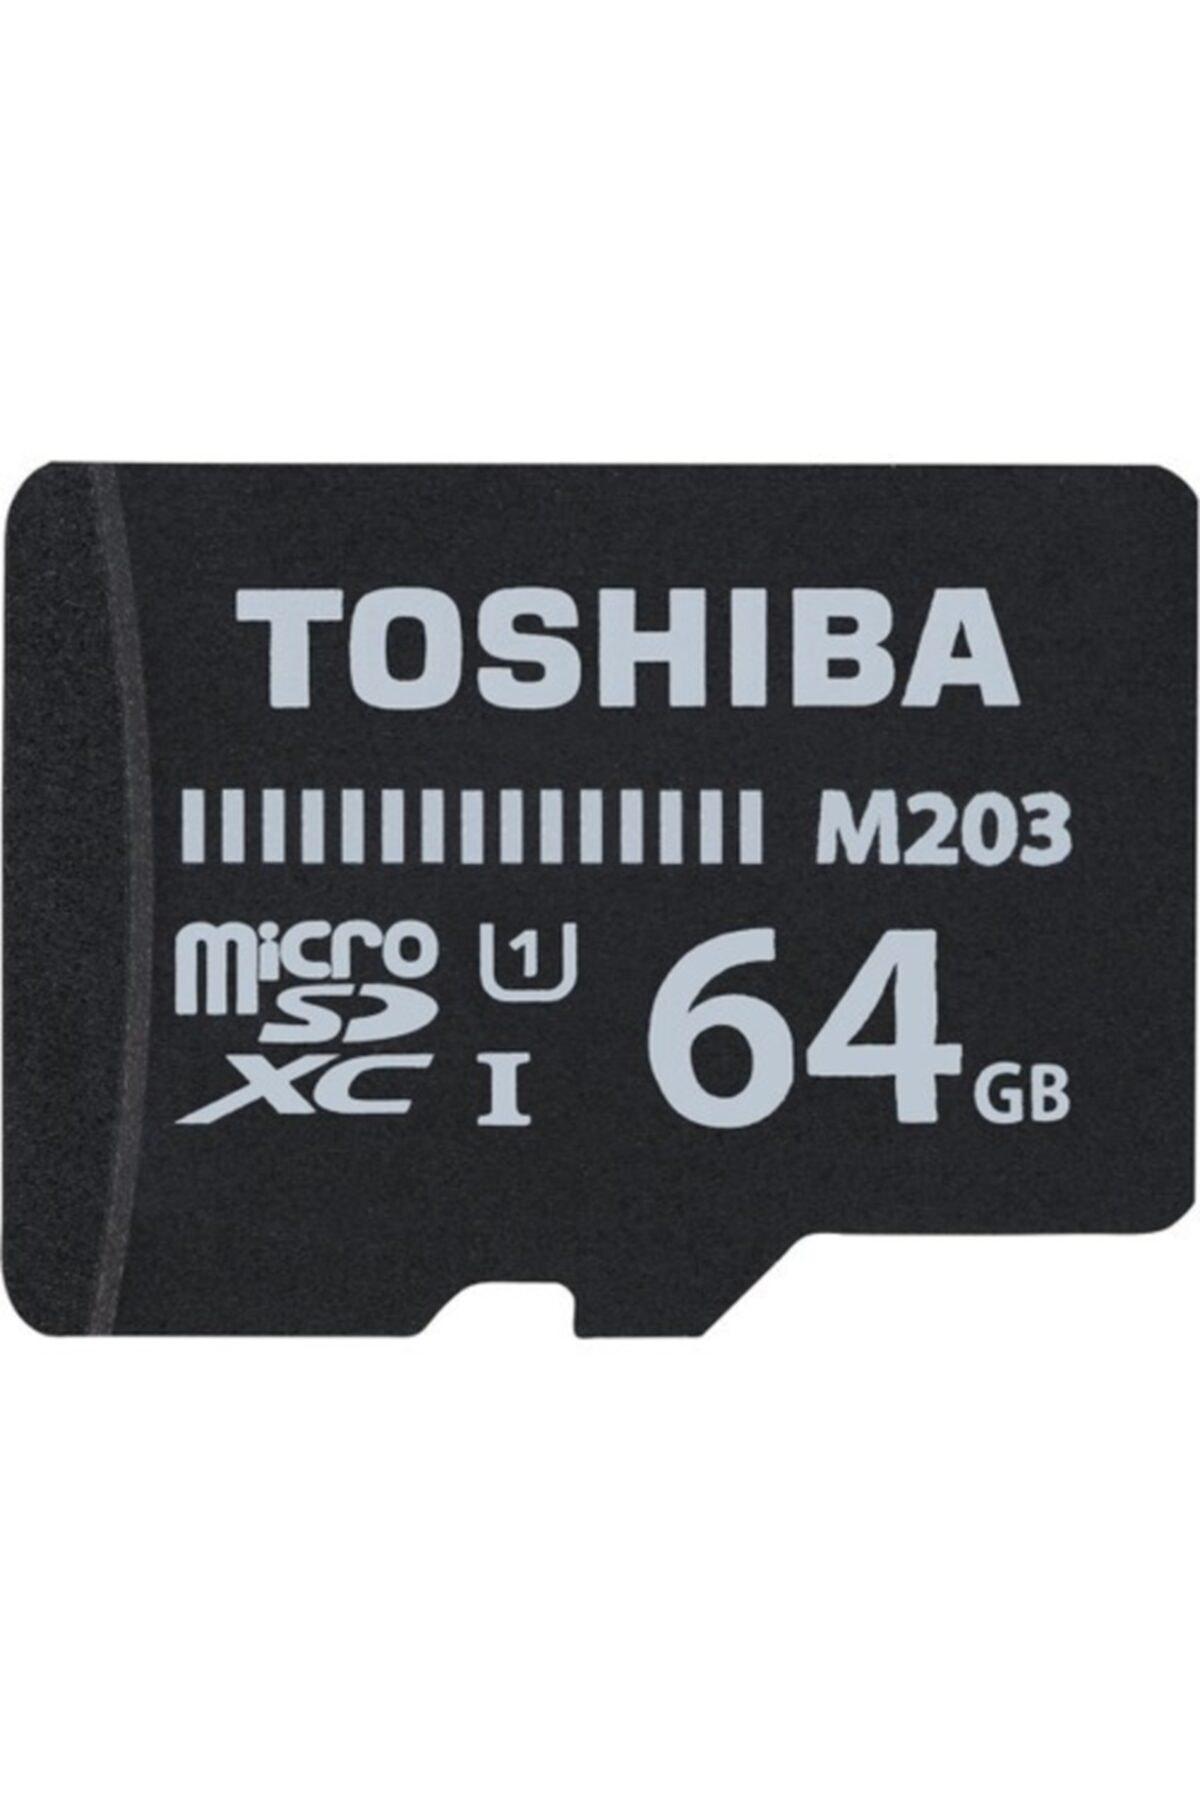 Toshiba 64gb 100mb/sn Microsdxc™ Uhs-1 Class10 Excerıa Thn-m203k0640ea 1